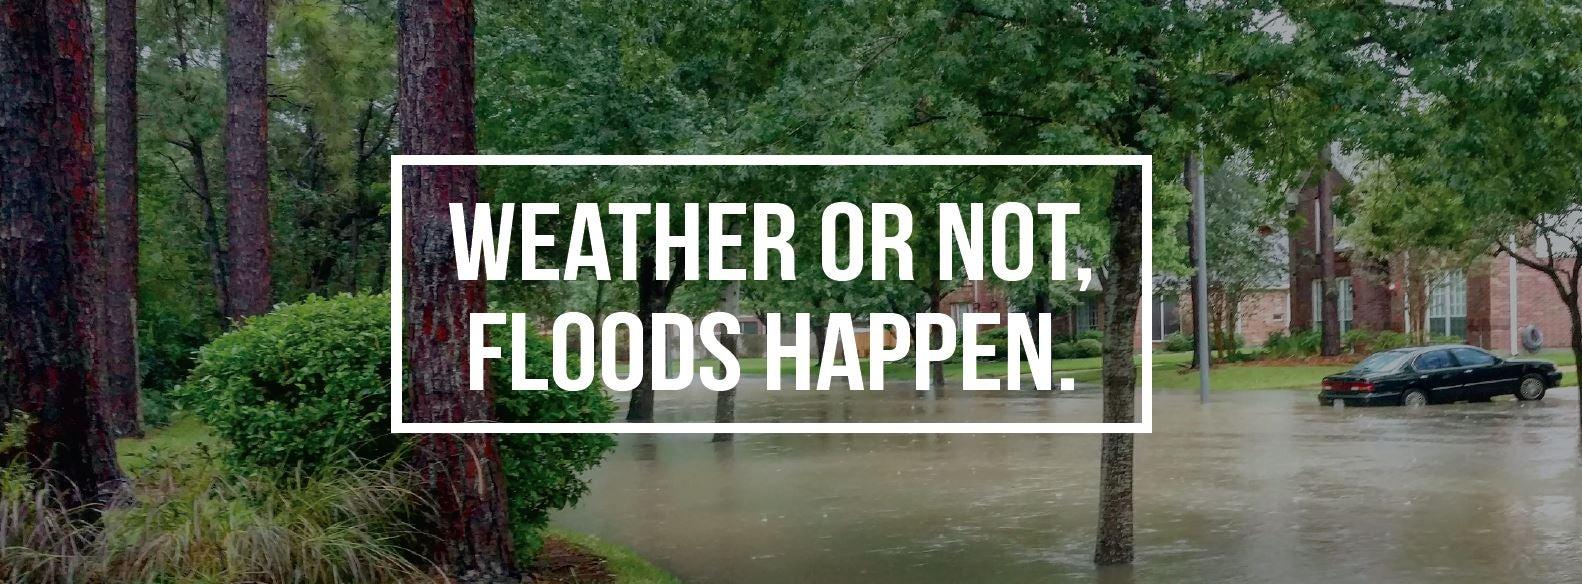 https://www.securityfirstflorida.com/sites/default/files/media/image/Intro-flood-happens.JPG